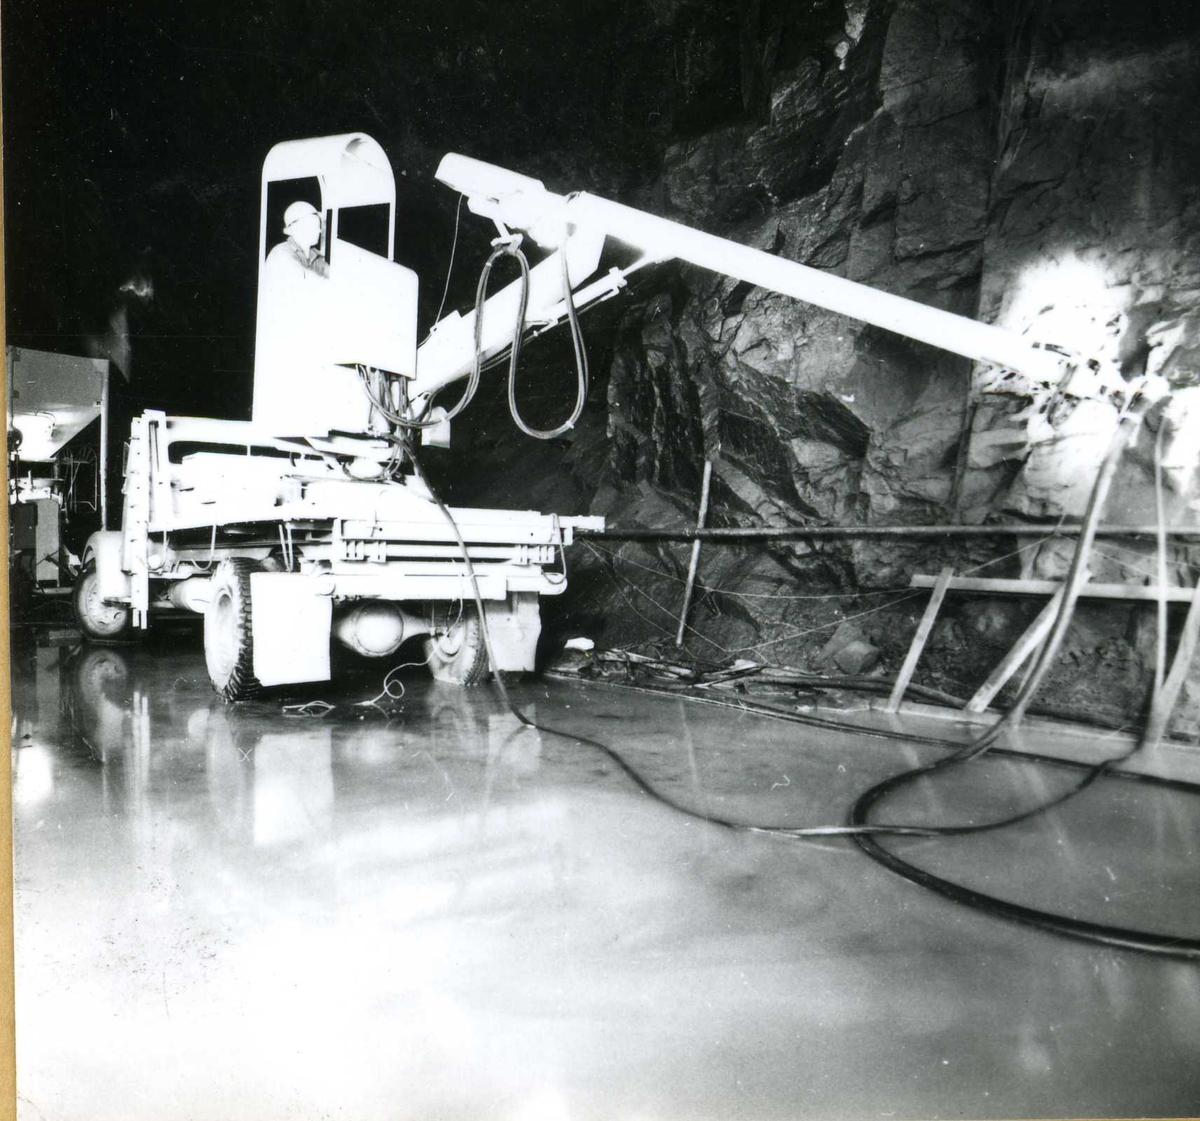 Tilløpstunnel frå Vesås. Bormaskin i tunnel.